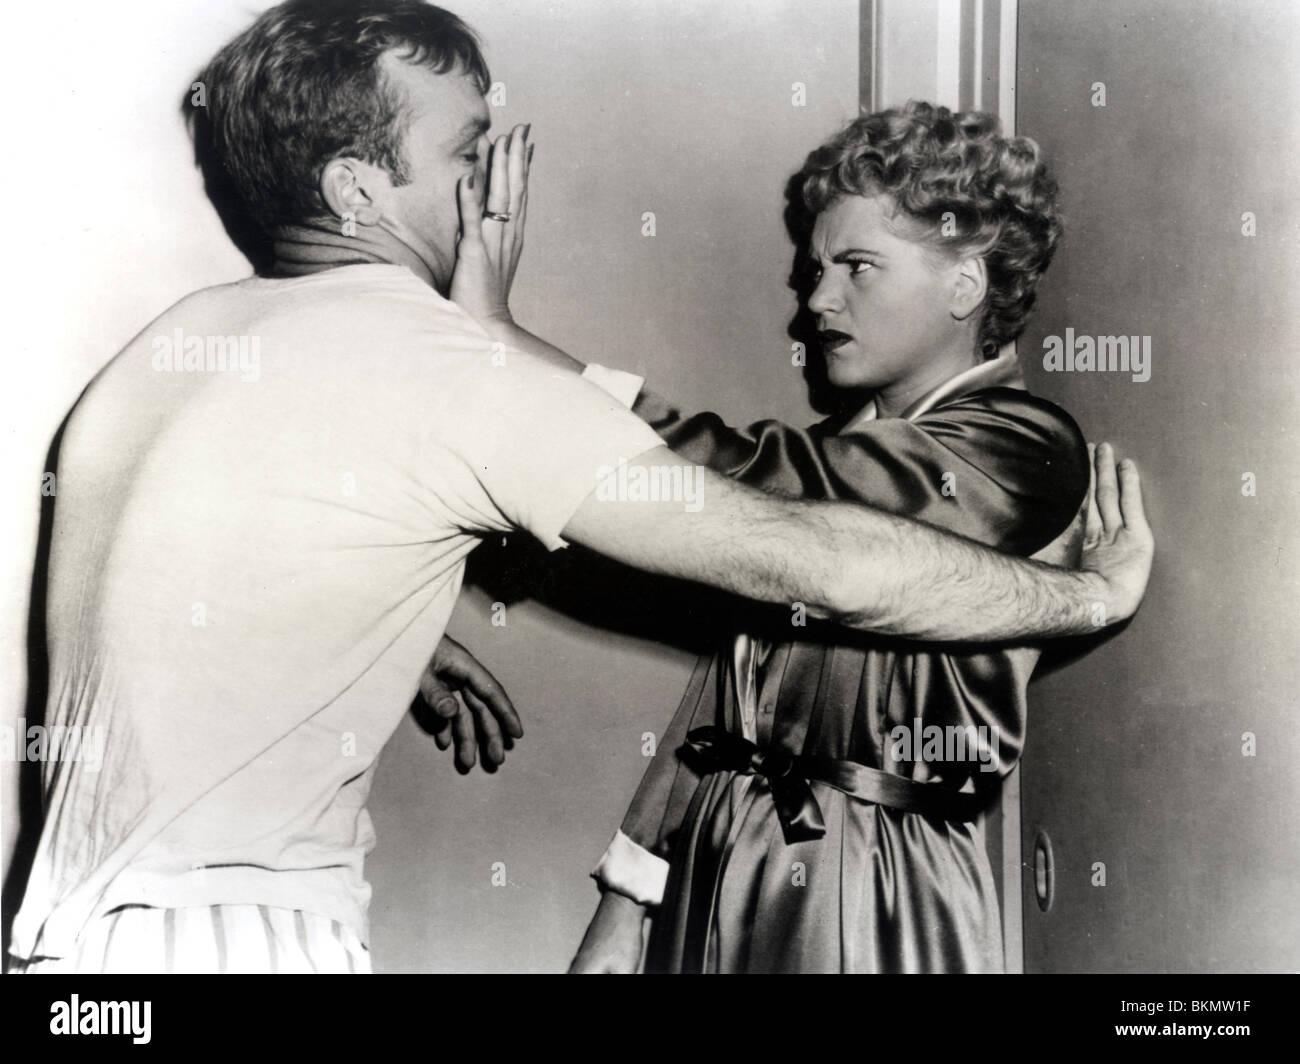 THE MARRYING KIND (1952) ALDO RAY, JUDY HOLLIDAY TMYK 001 P - Stock Image